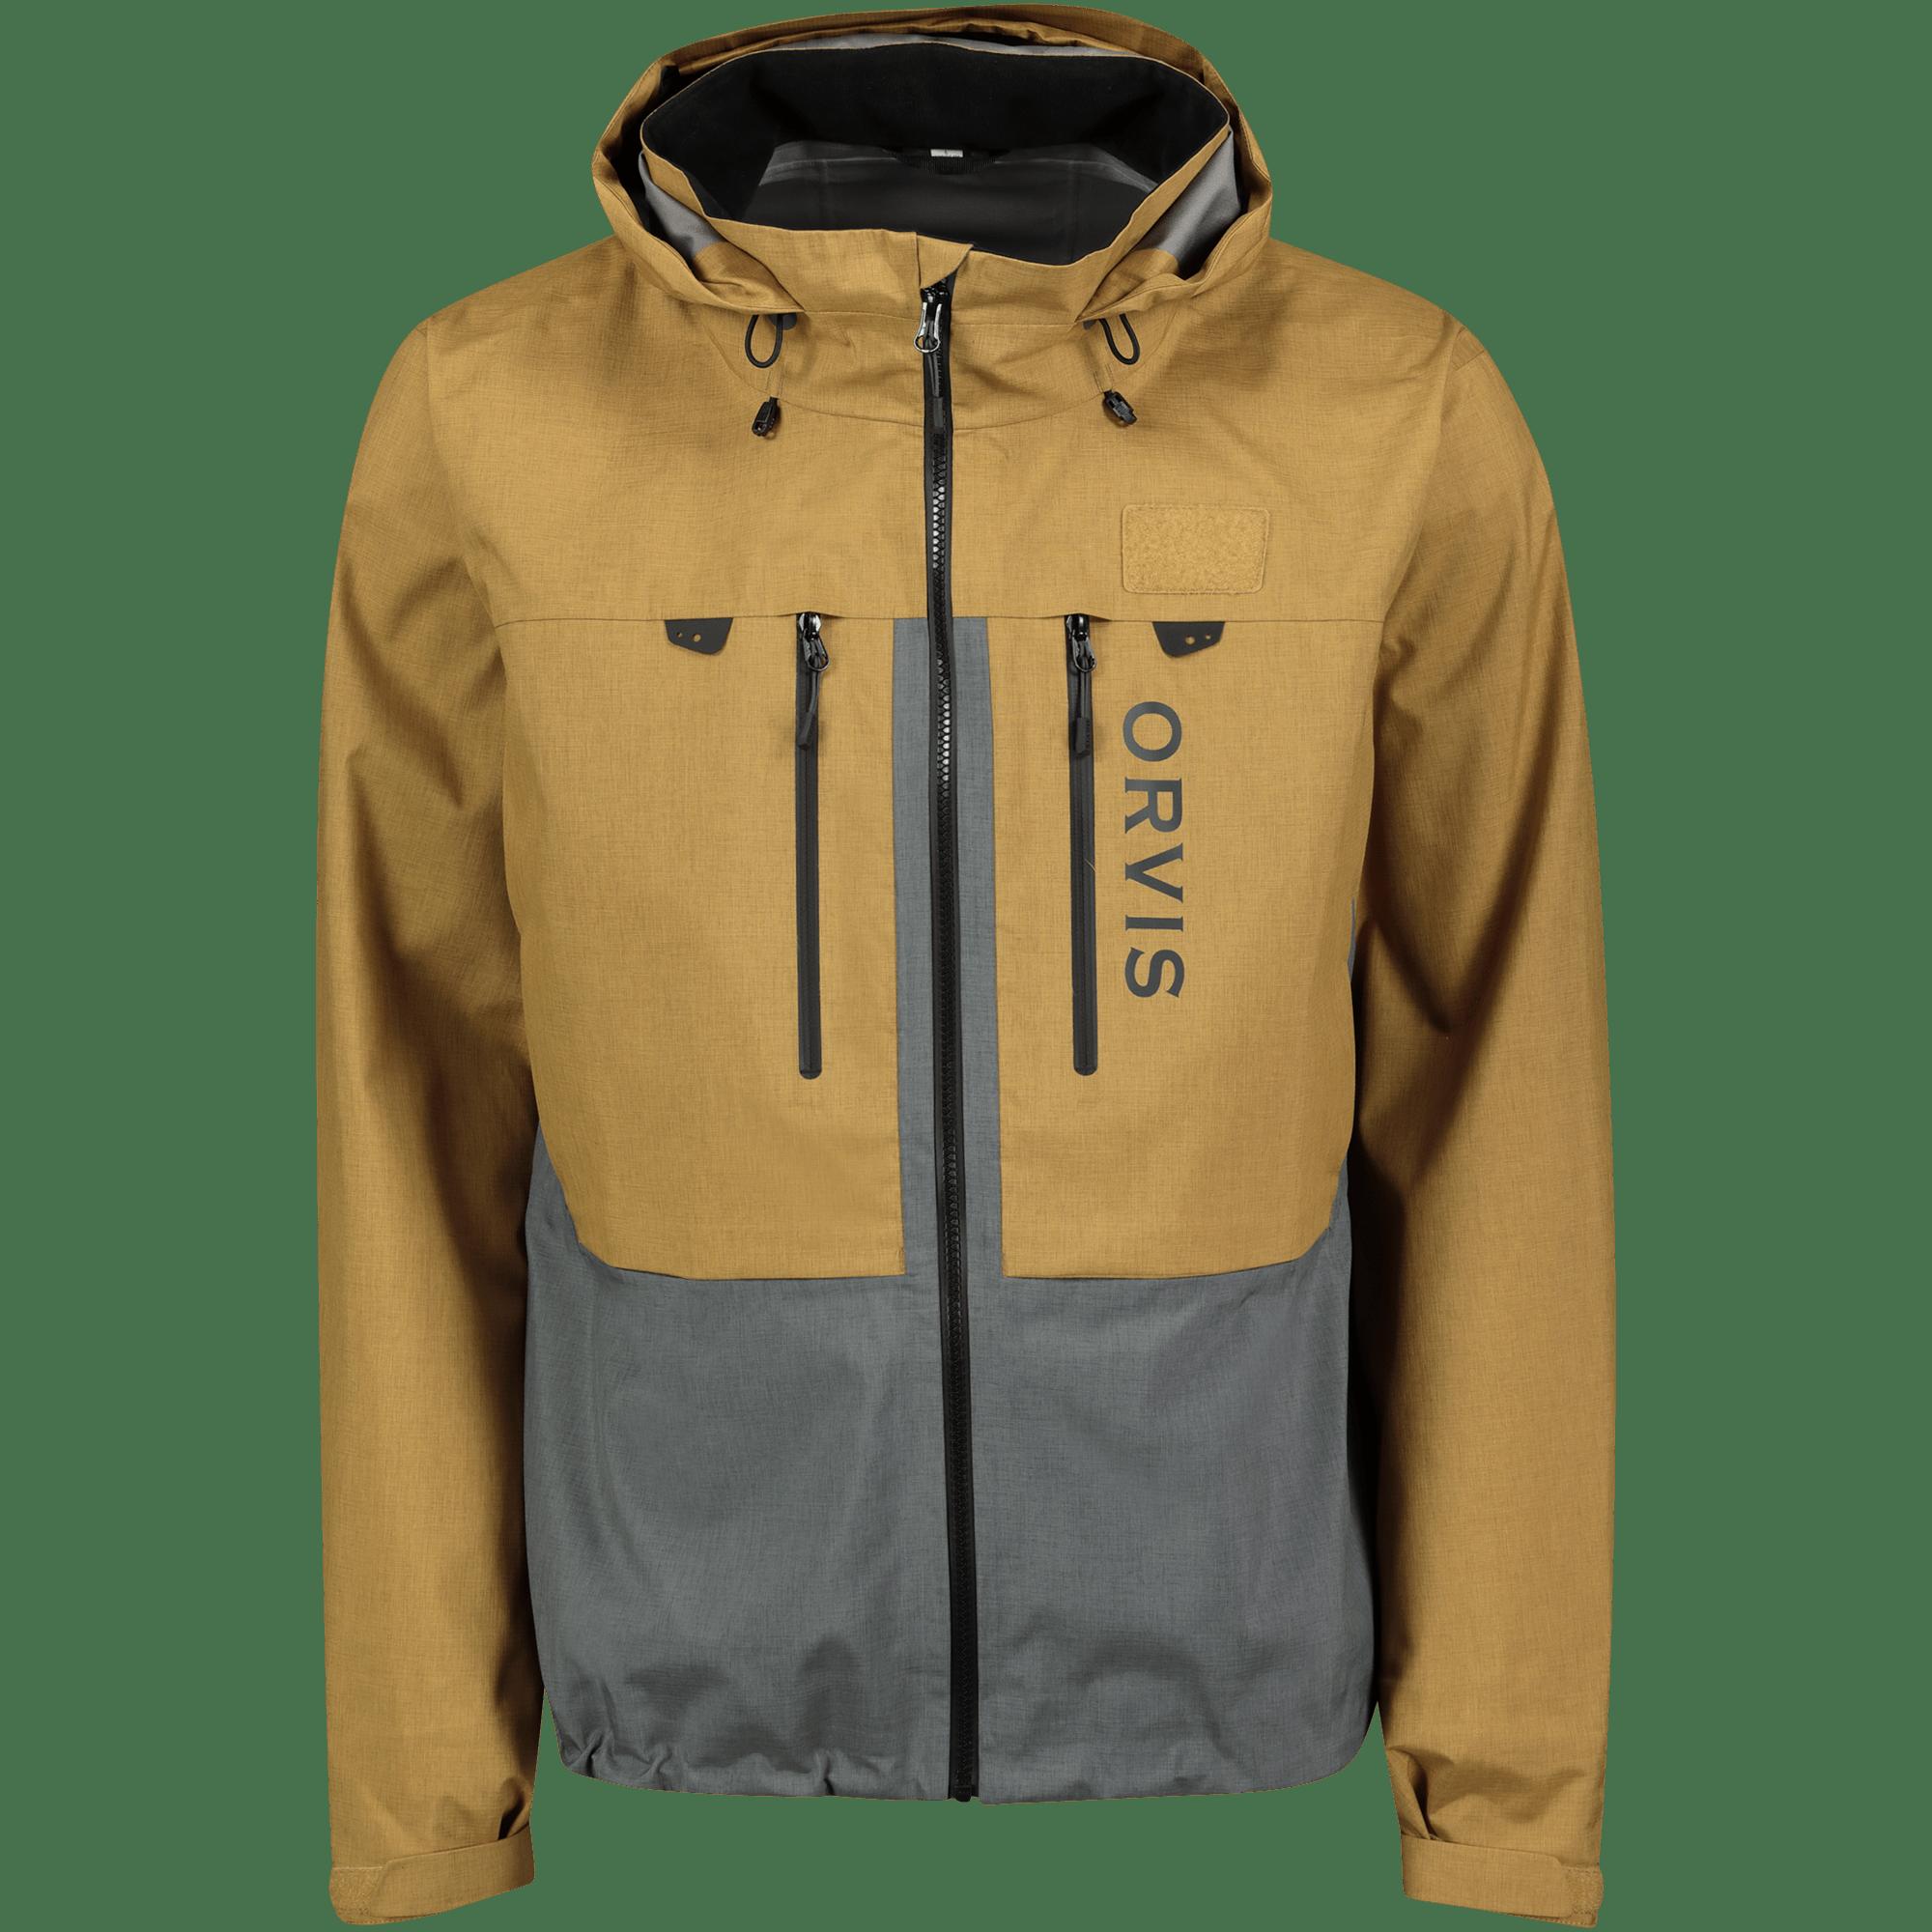 Orvis Pro Wading Jacket GrainAsh Jakke & Genser | XXL